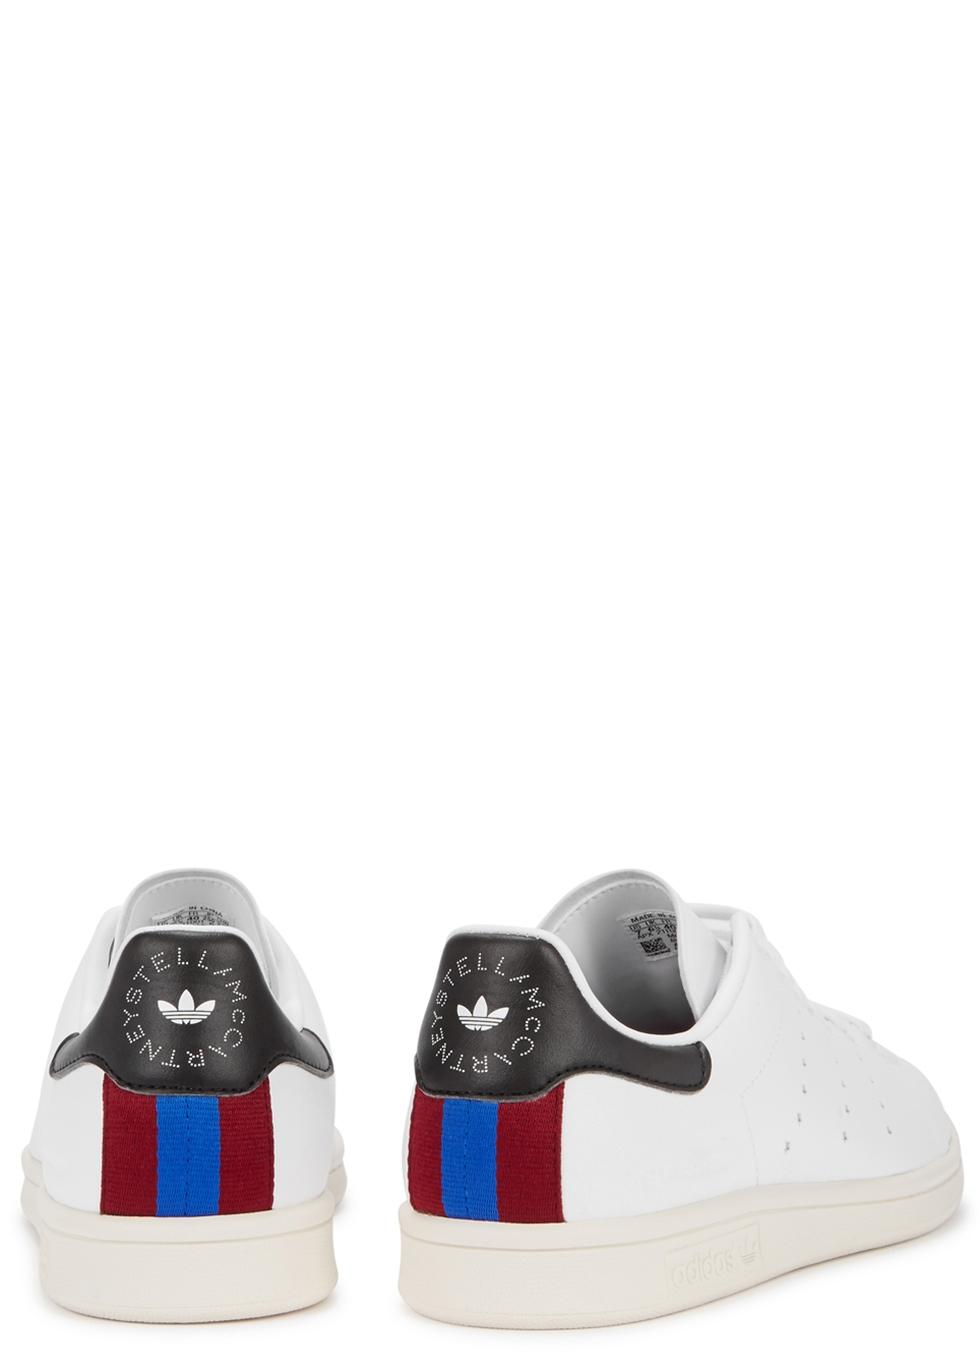 Stan Smith Trainers Mccartney Adidas Harvey X Faux Stella Leather wtFfI